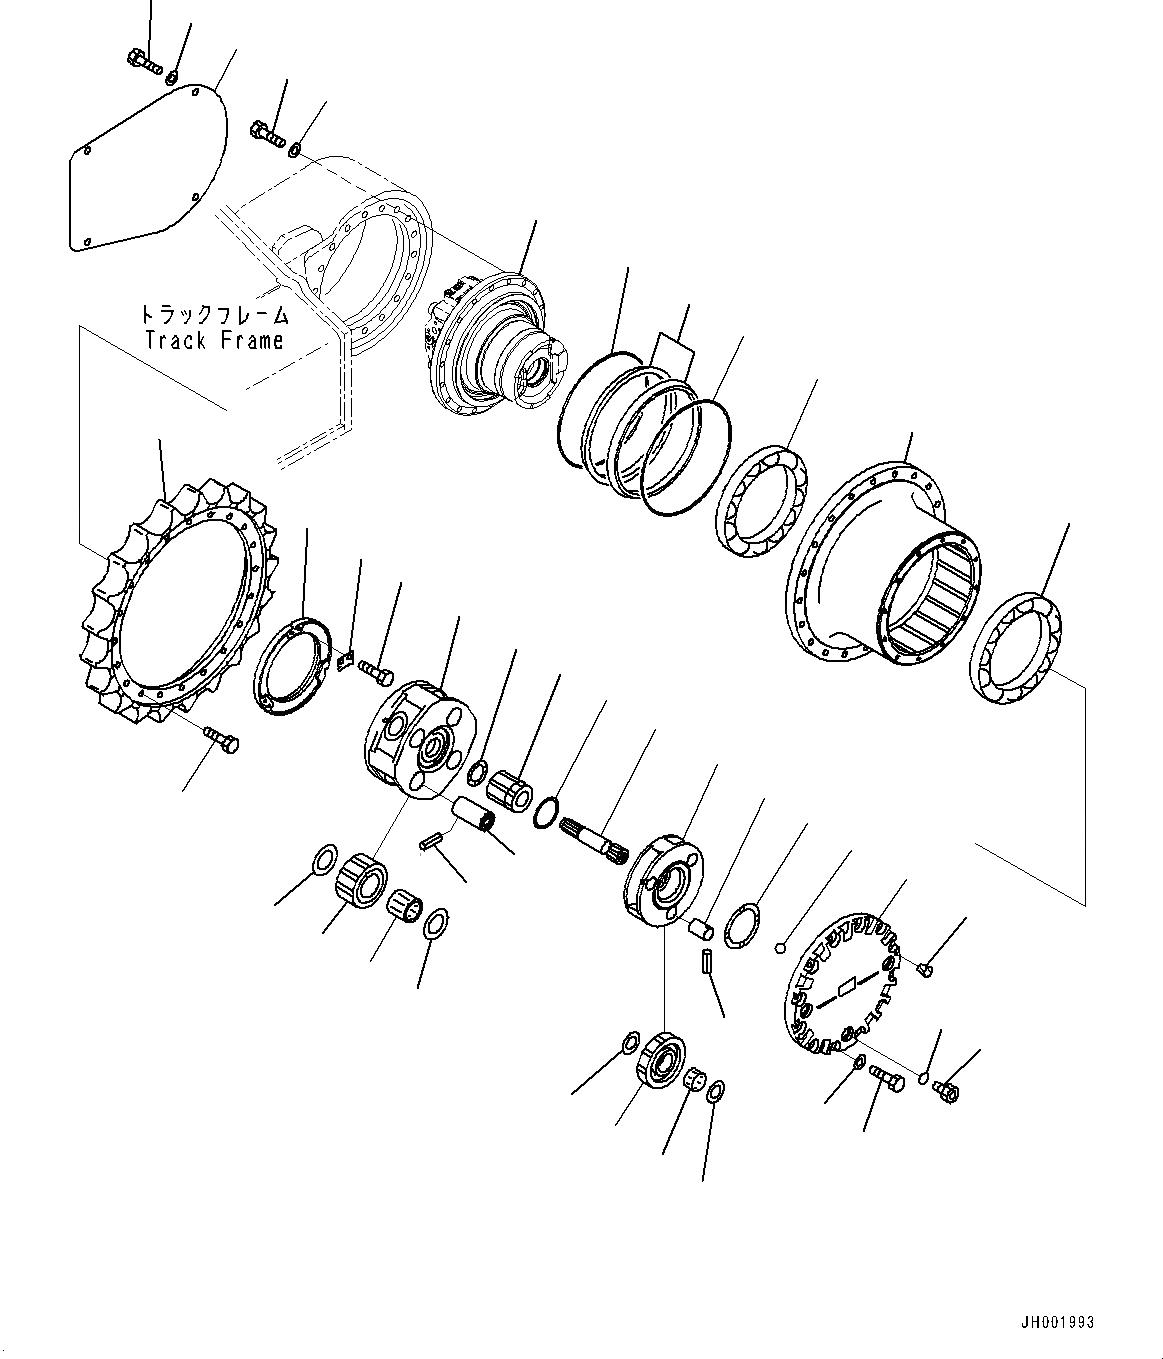 Komatsu Pc200 8 Travel Gearbox 20y 27